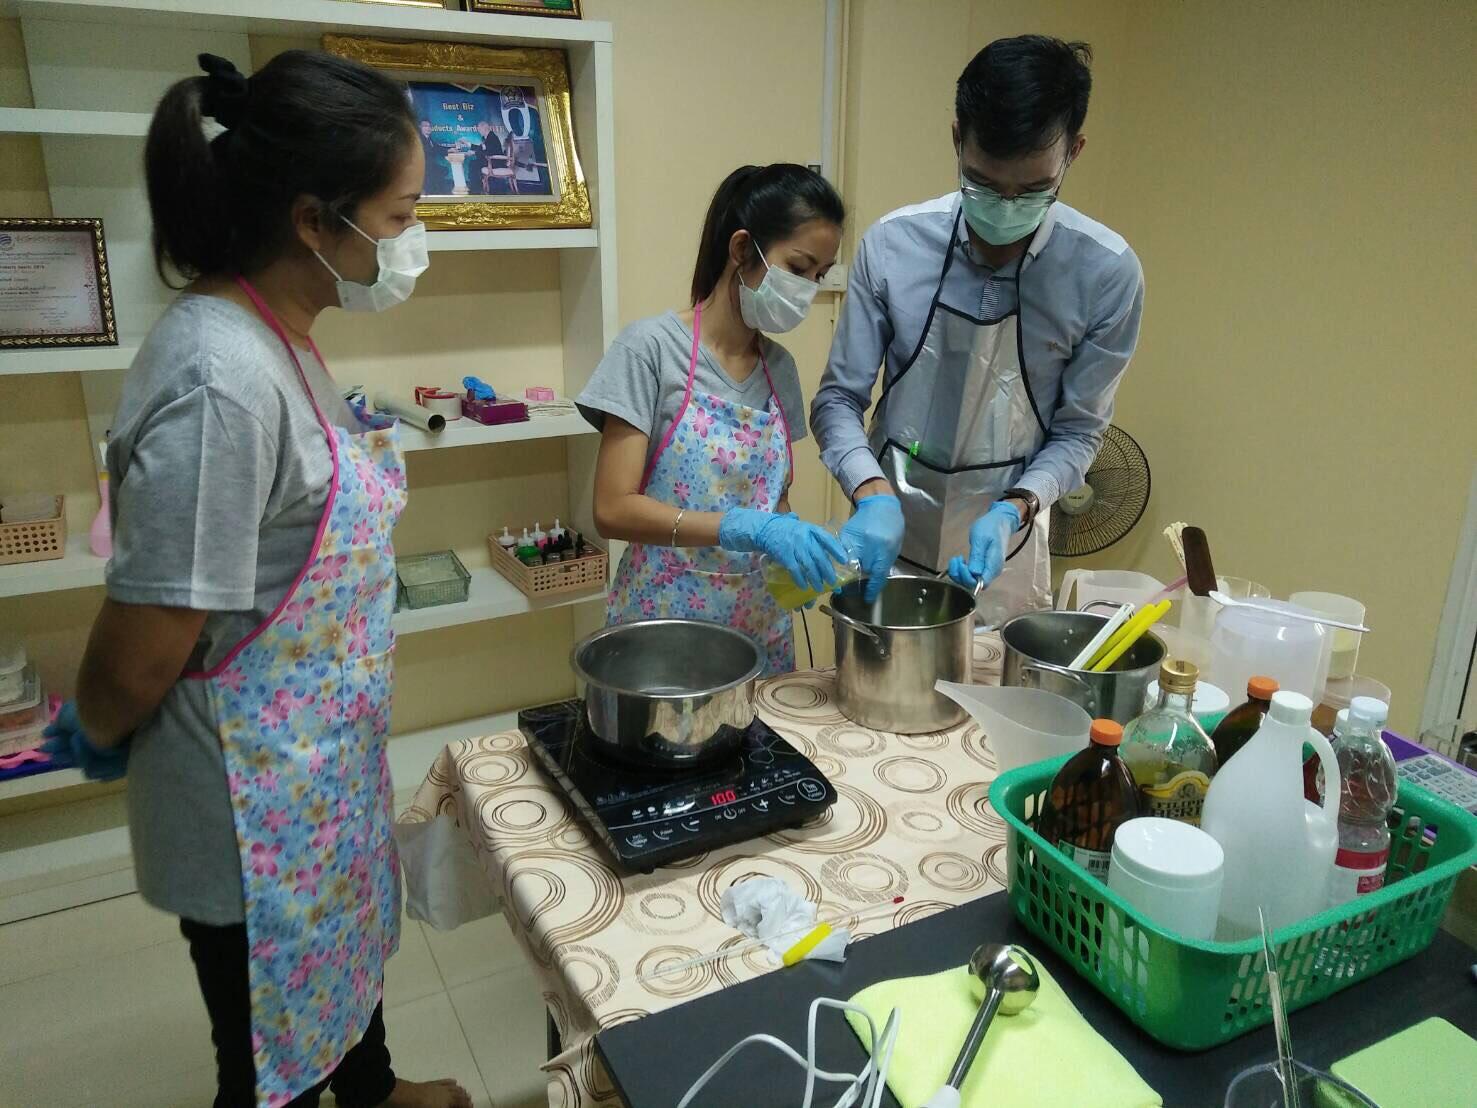 soap maker วิธีทำสบู่ สอนทำสบู่5